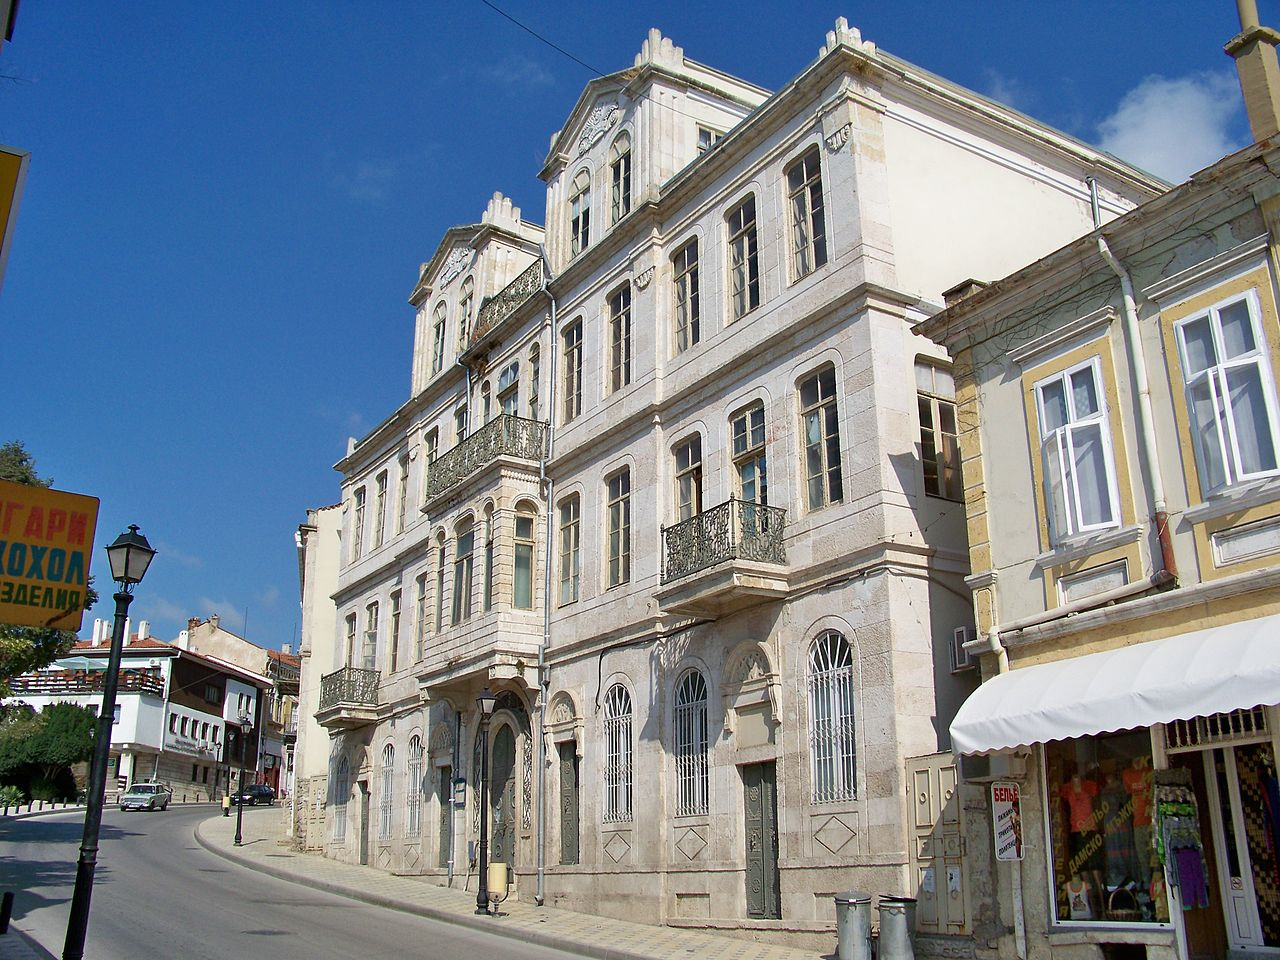 Bulgaria-Balchik-old_building-from-19th-century